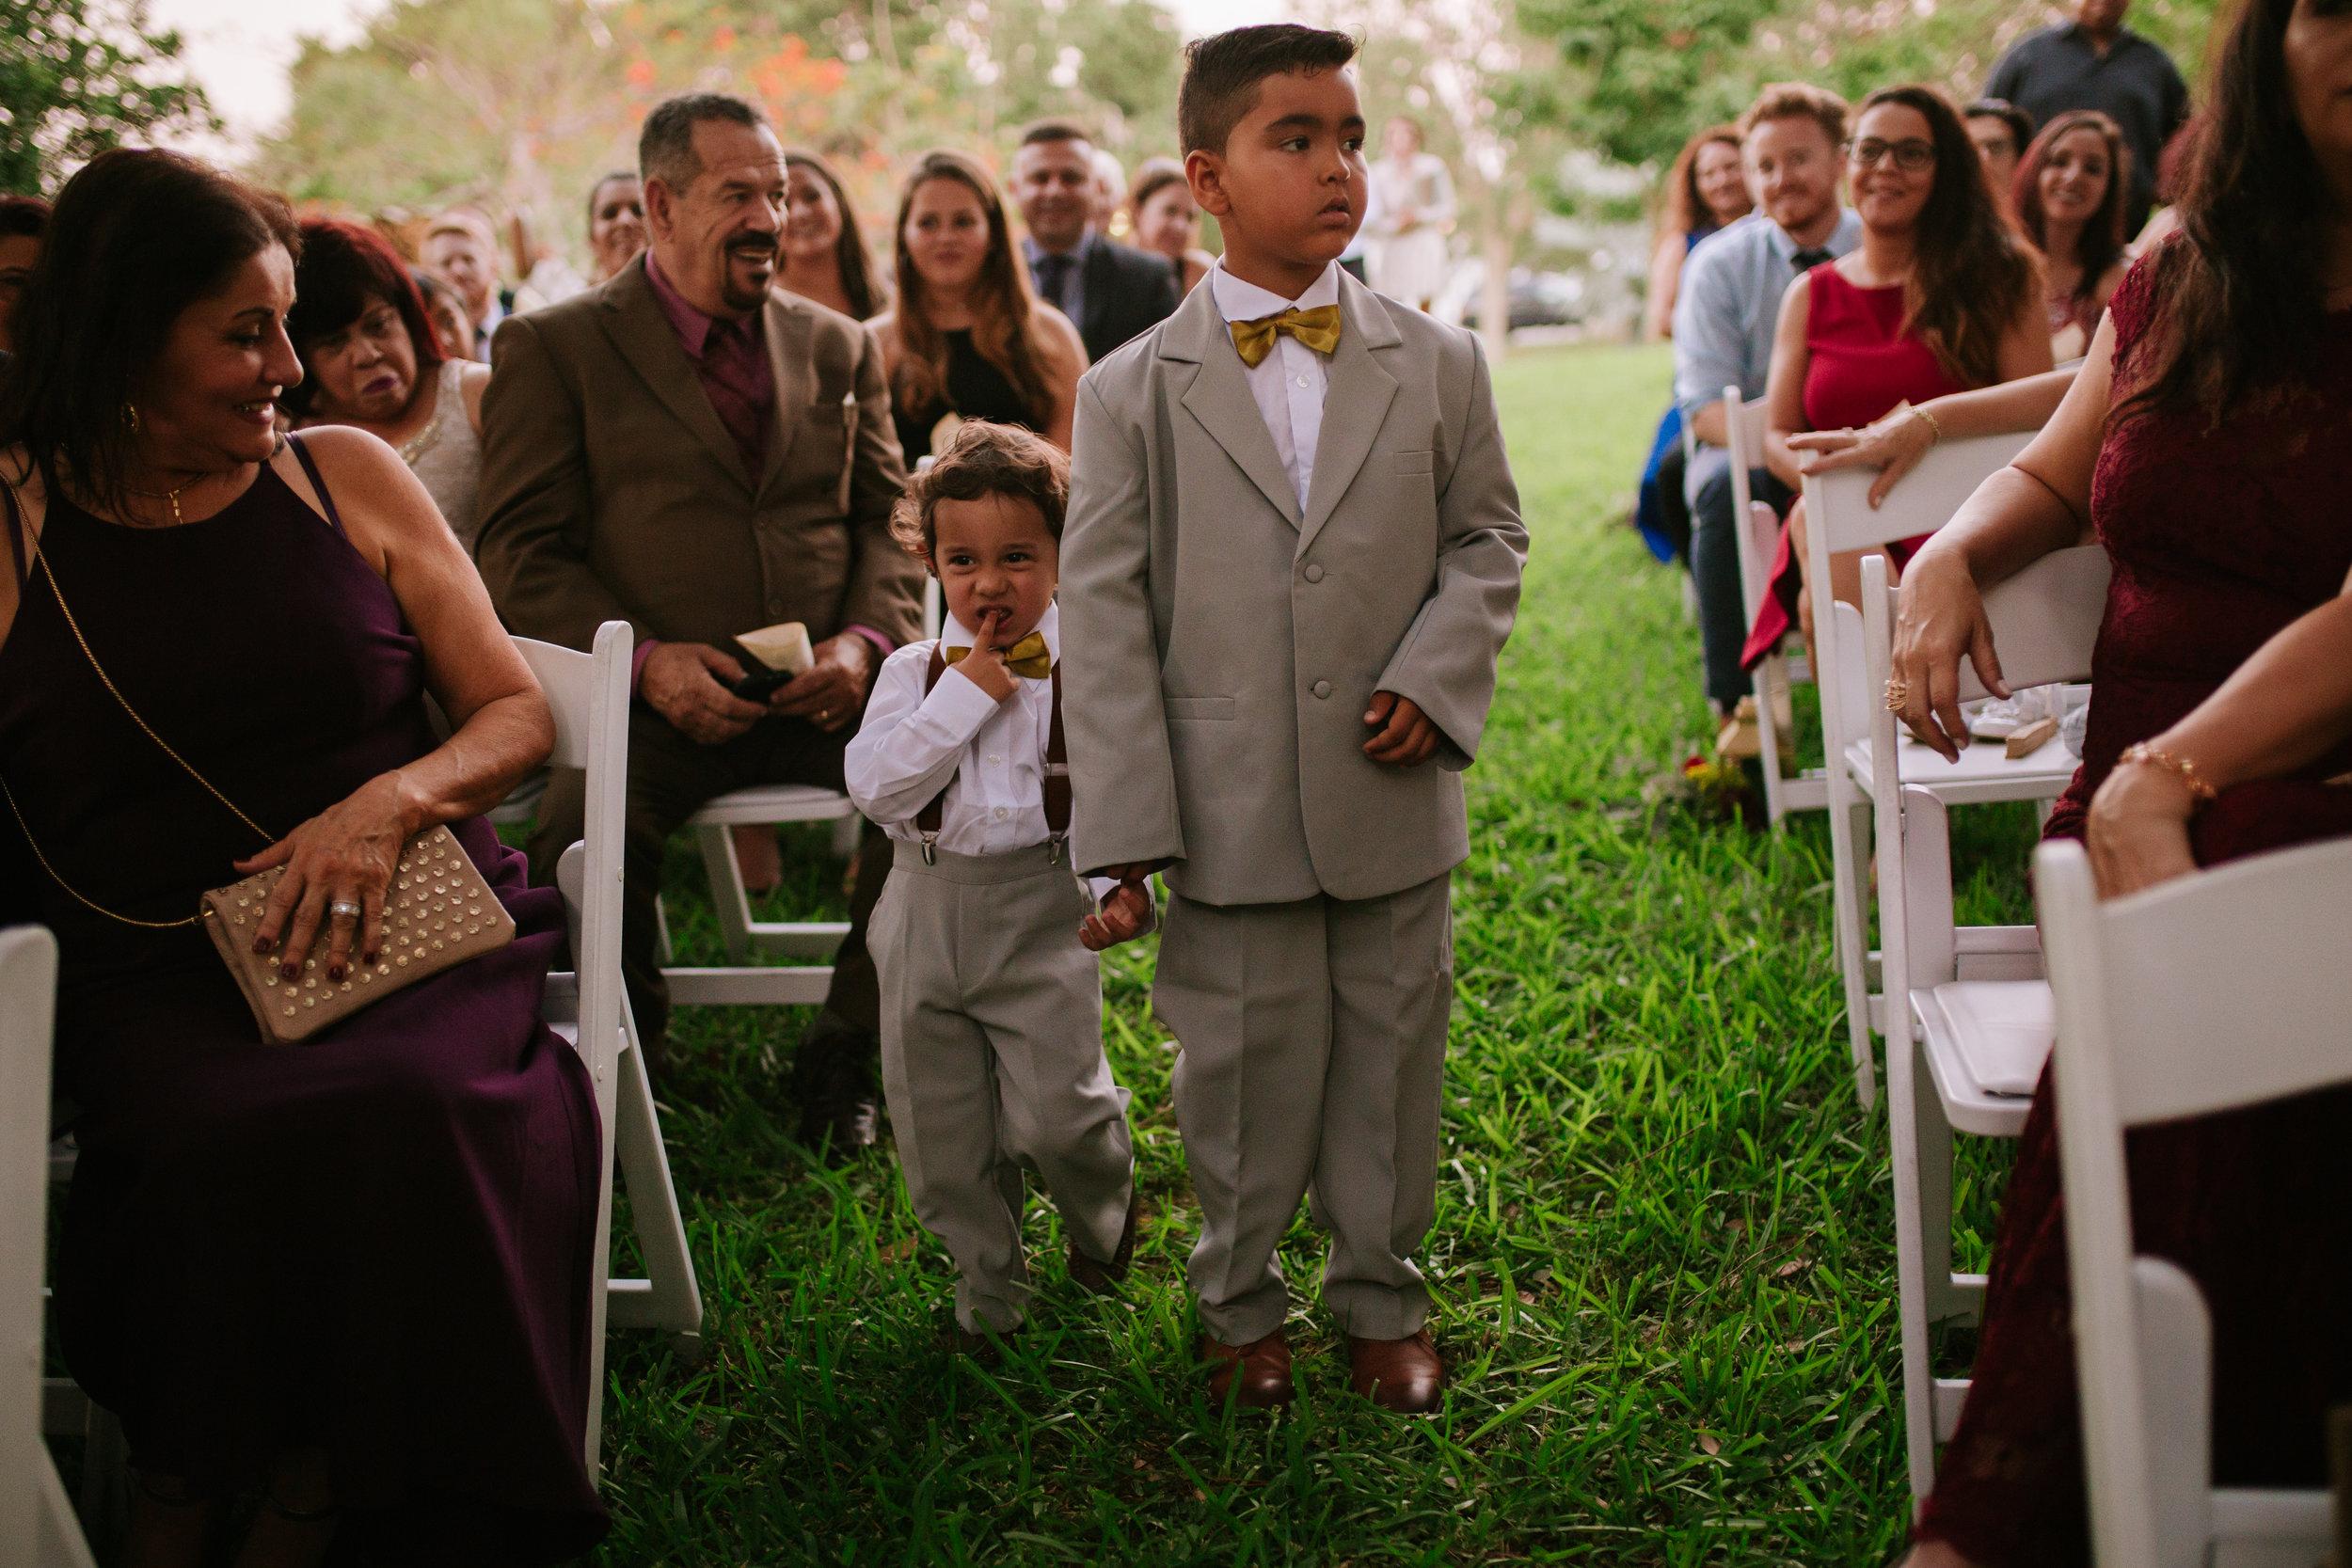 2017.05.23 Barbara and Mauricio Sales Port St Lucie Wedding (413 of 772).jpg